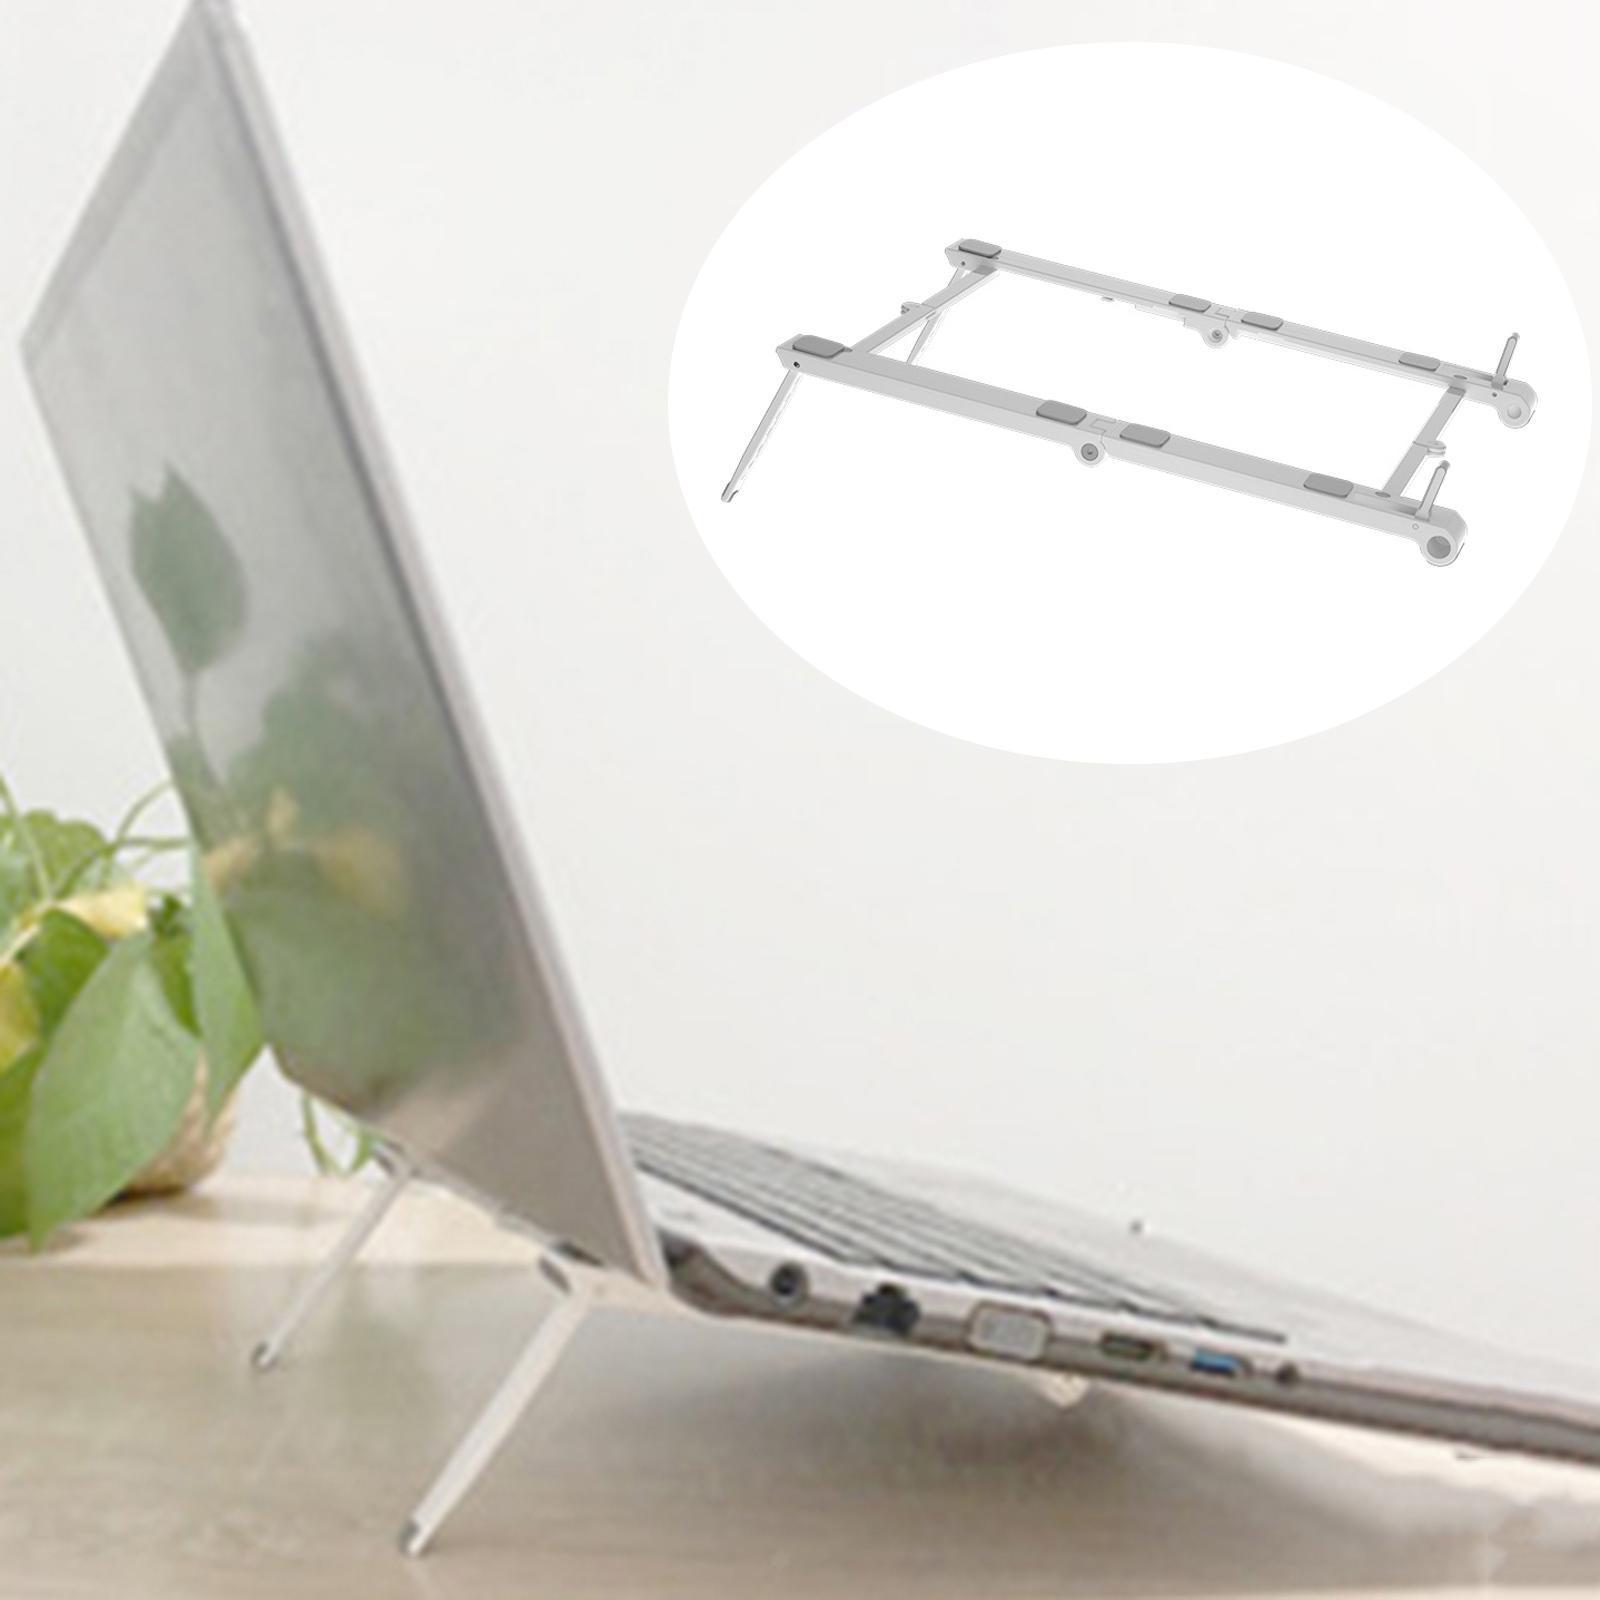 thumbnail 7 - 3 in1 Adjustable Laptop Stand Ergonomic Folding Hollow Radiating for Bracket